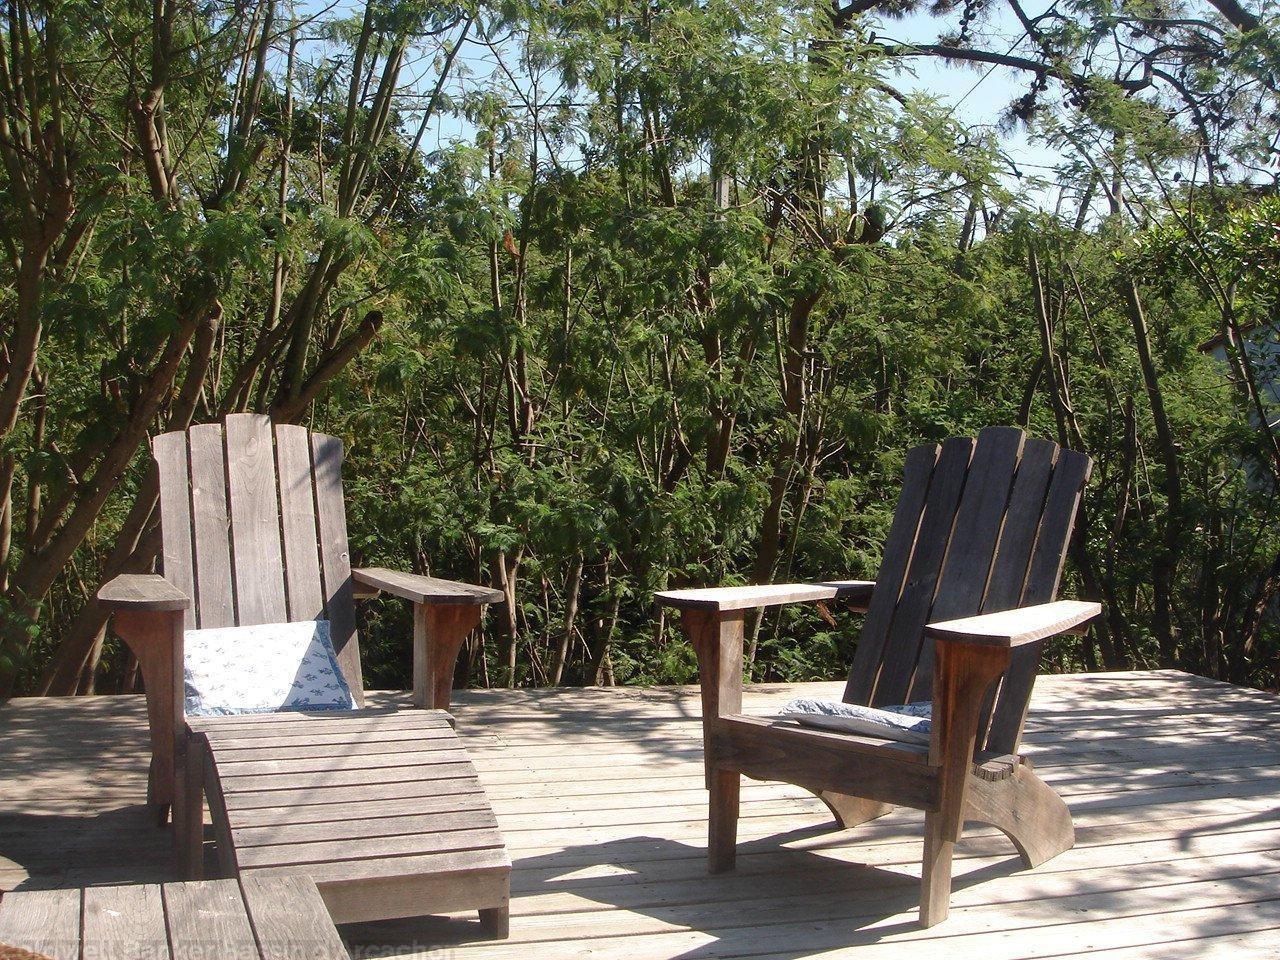 vente maison villa lege cap ferret 44 hectares superbe. Black Bedroom Furniture Sets. Home Design Ideas